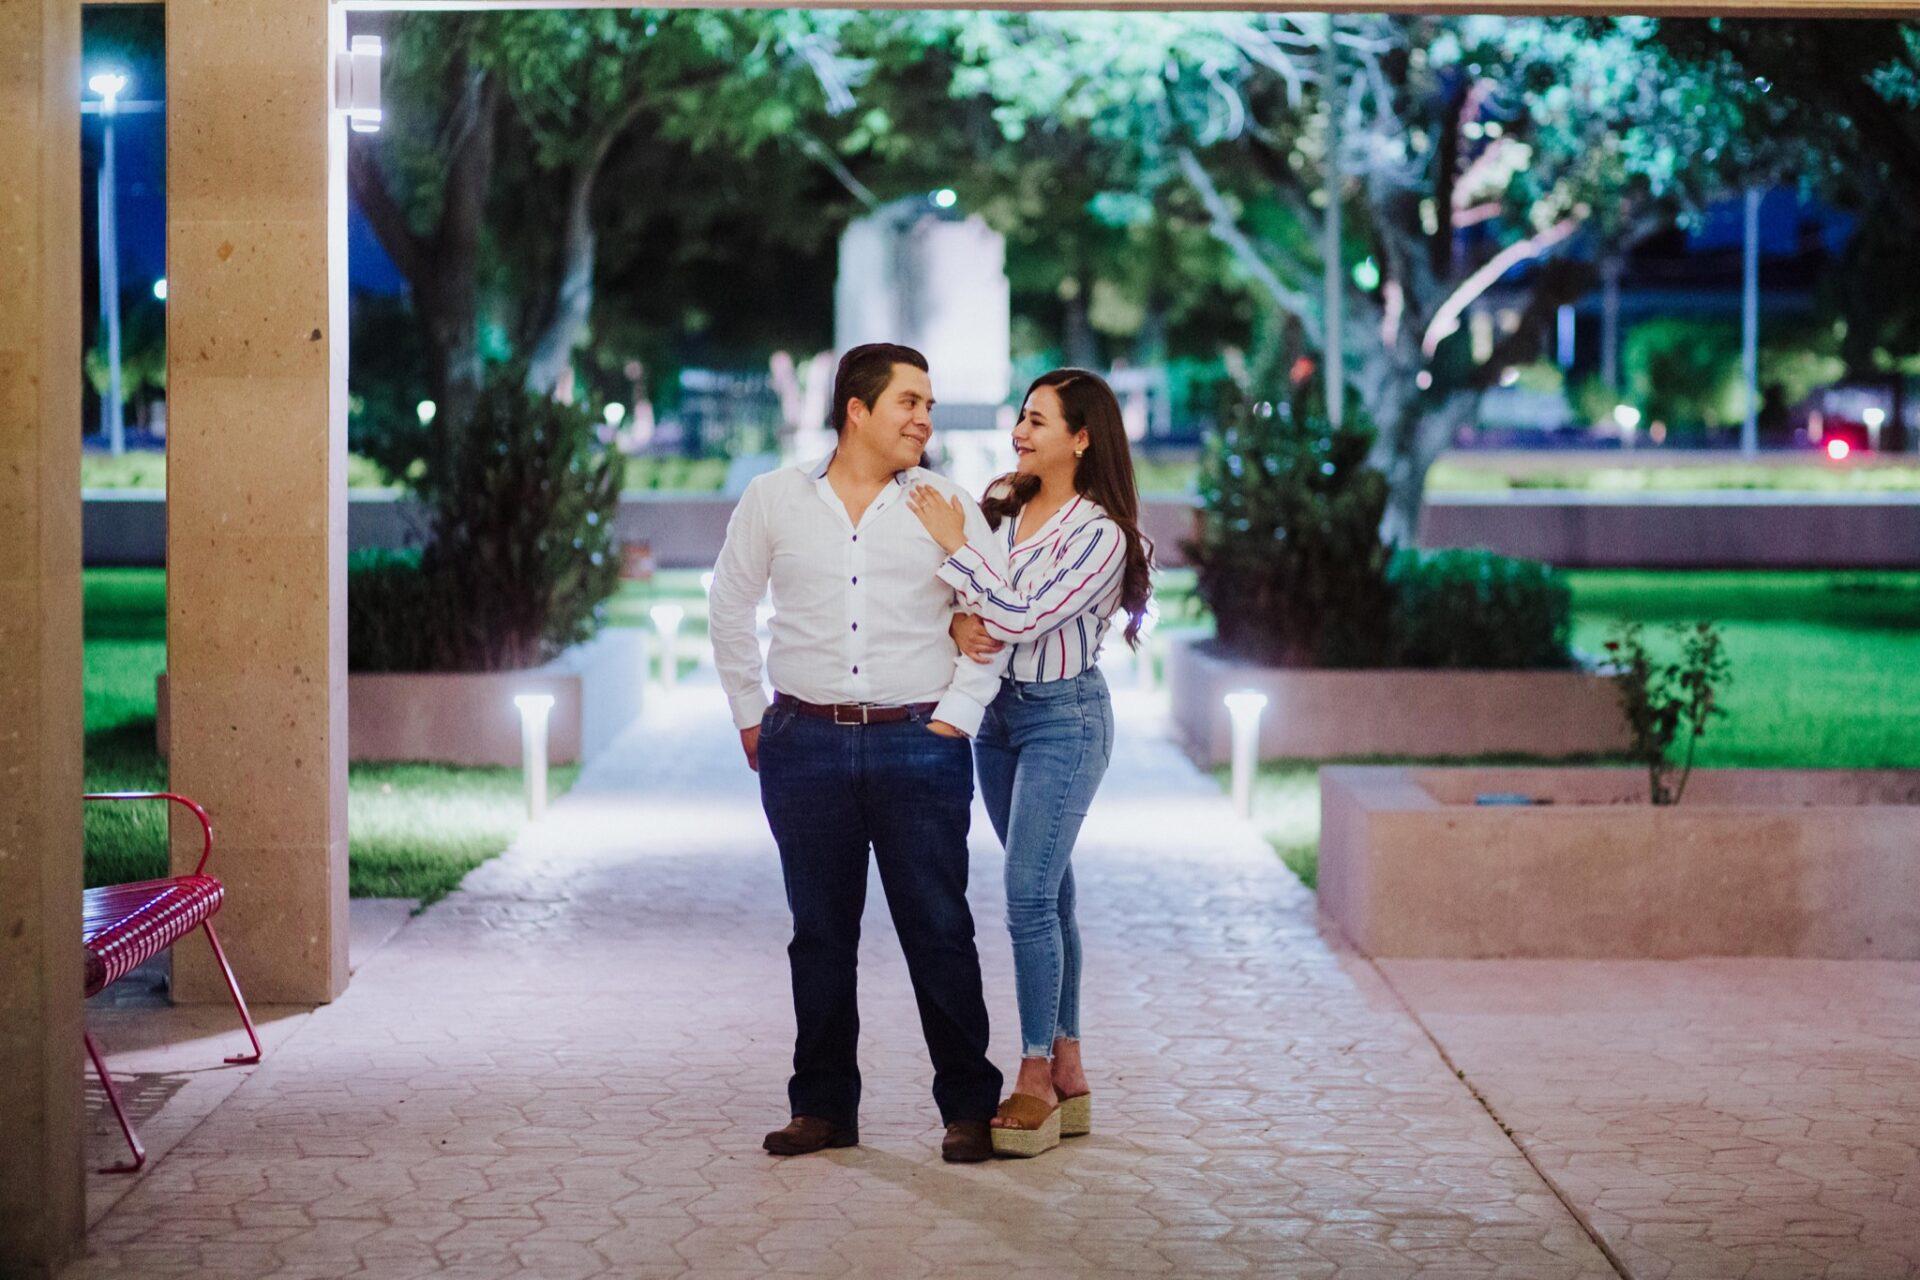 javier_noriega_fotografo_bodas_save_the_date_preboda_torreon_coahuila_zacatecas_wedding_photographer8